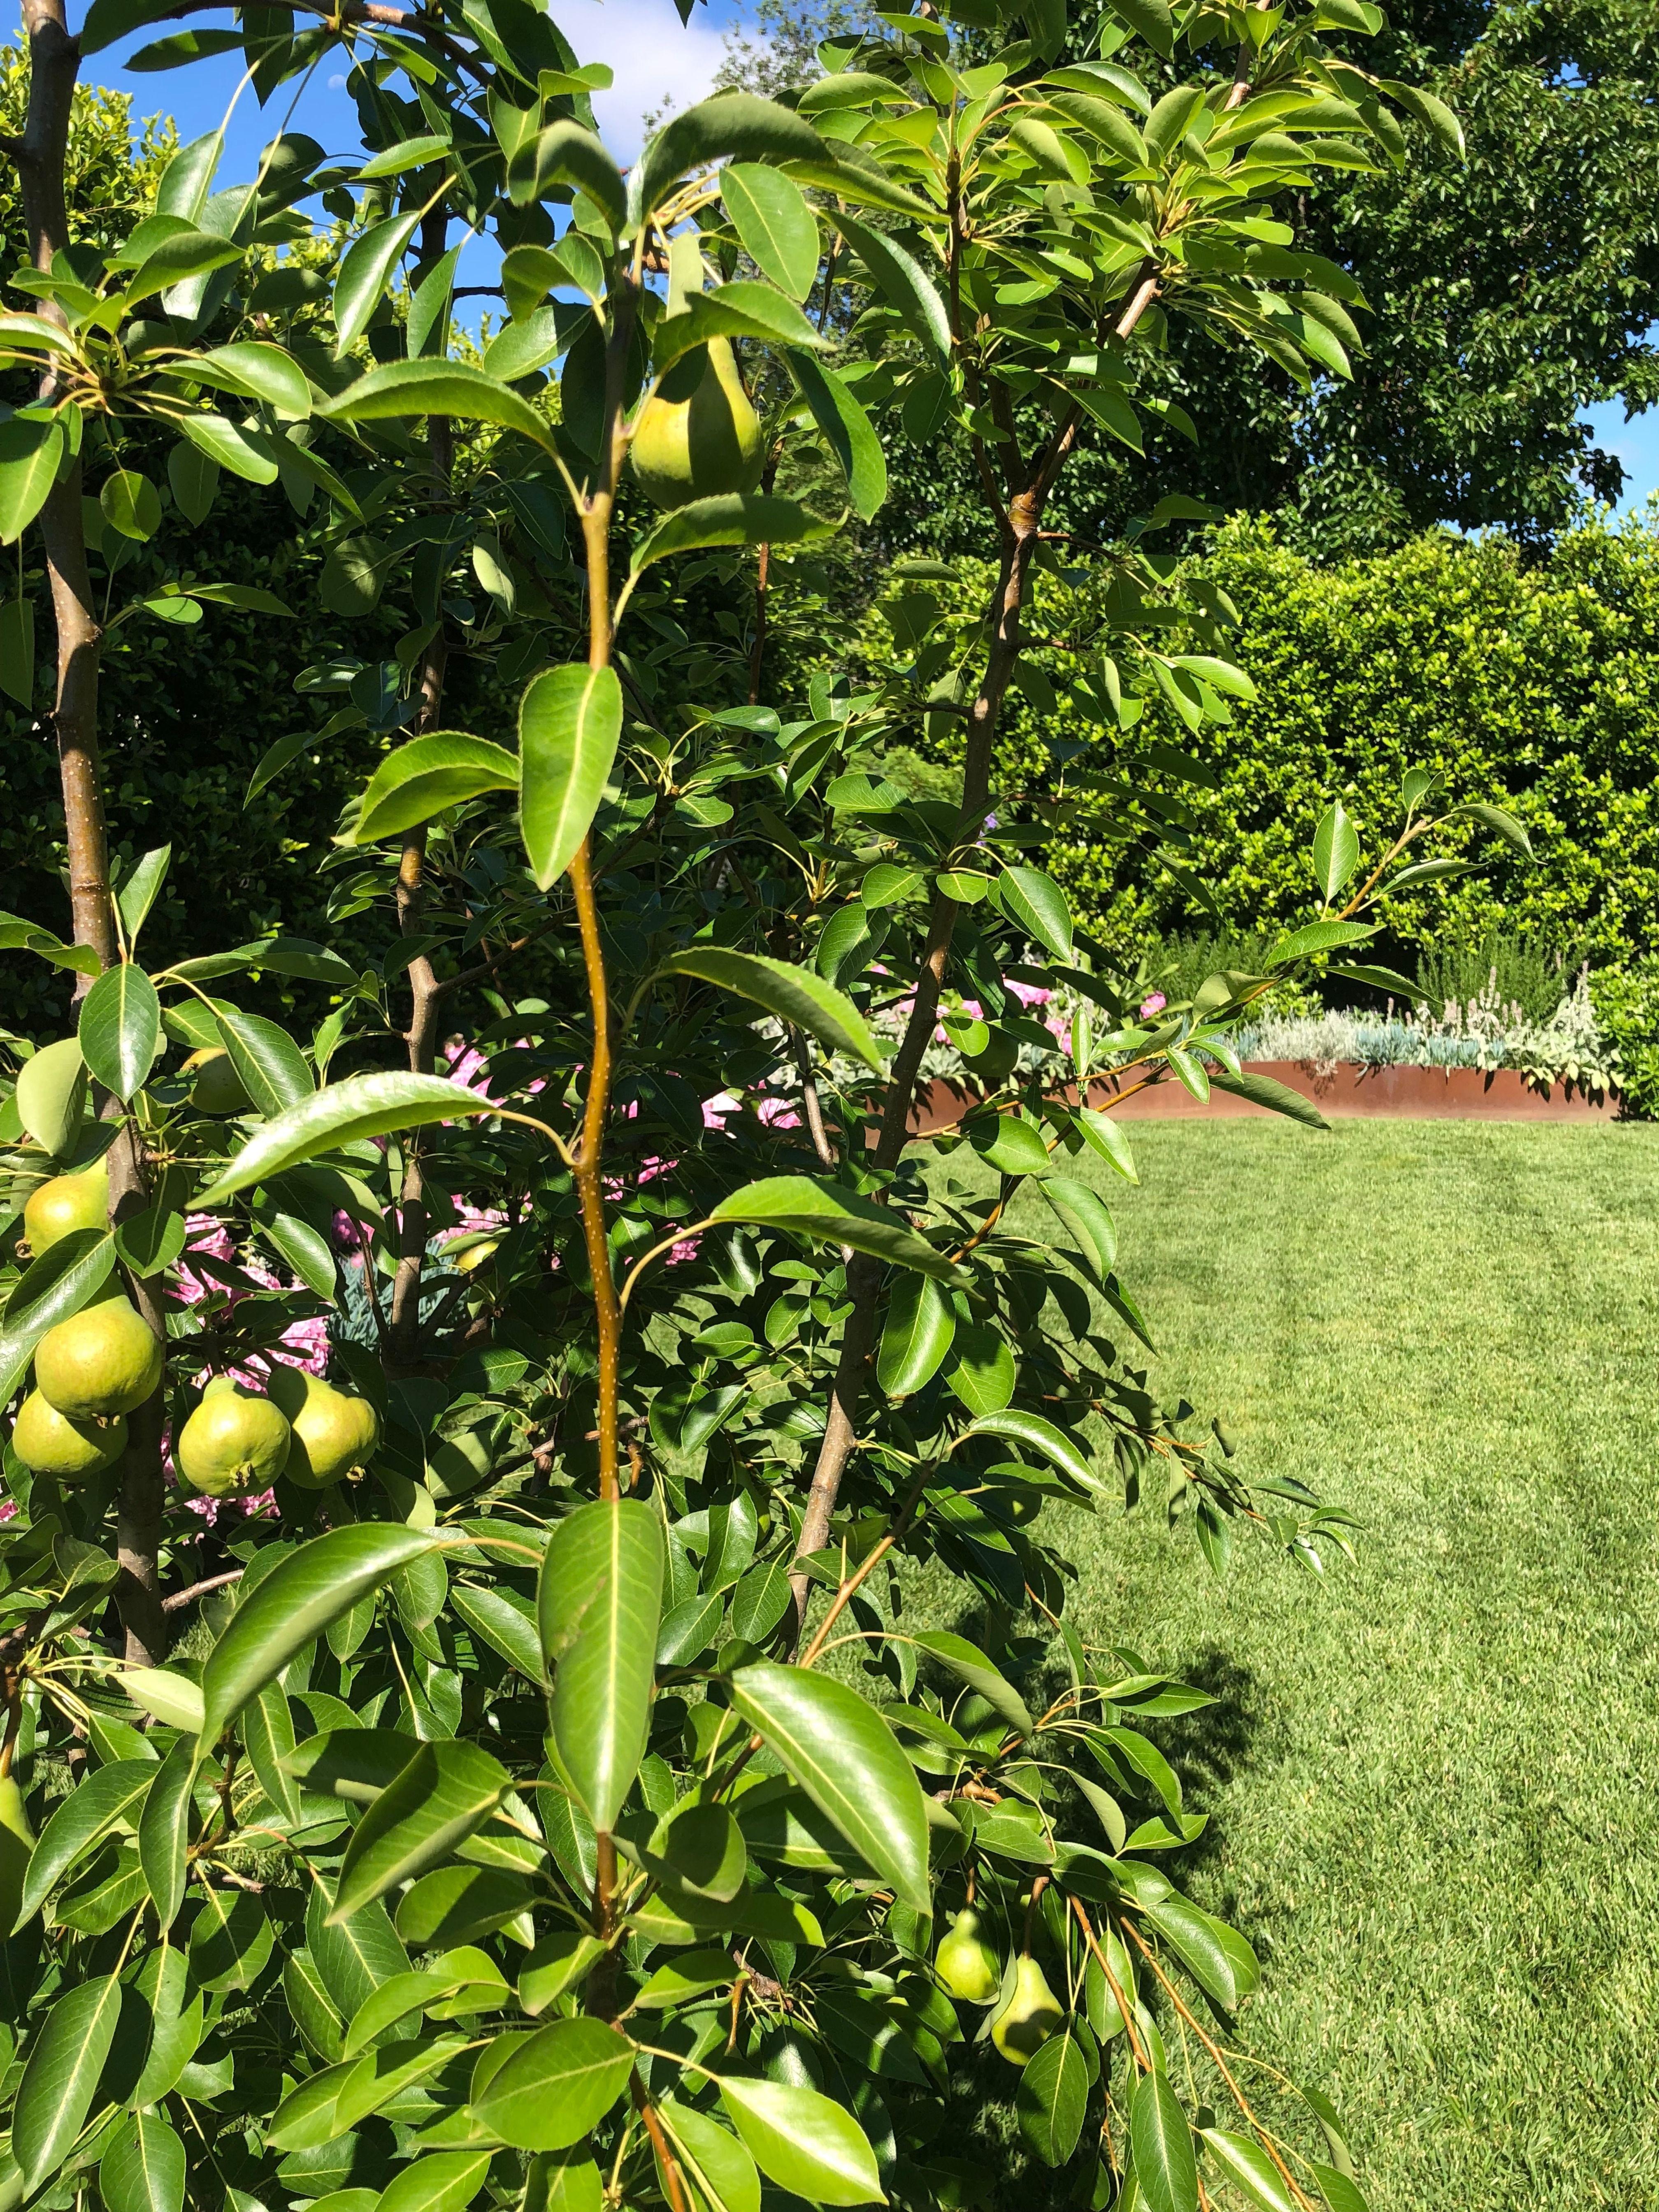 Fruit Trees To Private Front Garden Source Ginkgoparadise Com Au Paradise Landscape Landscape Materials Front Garden